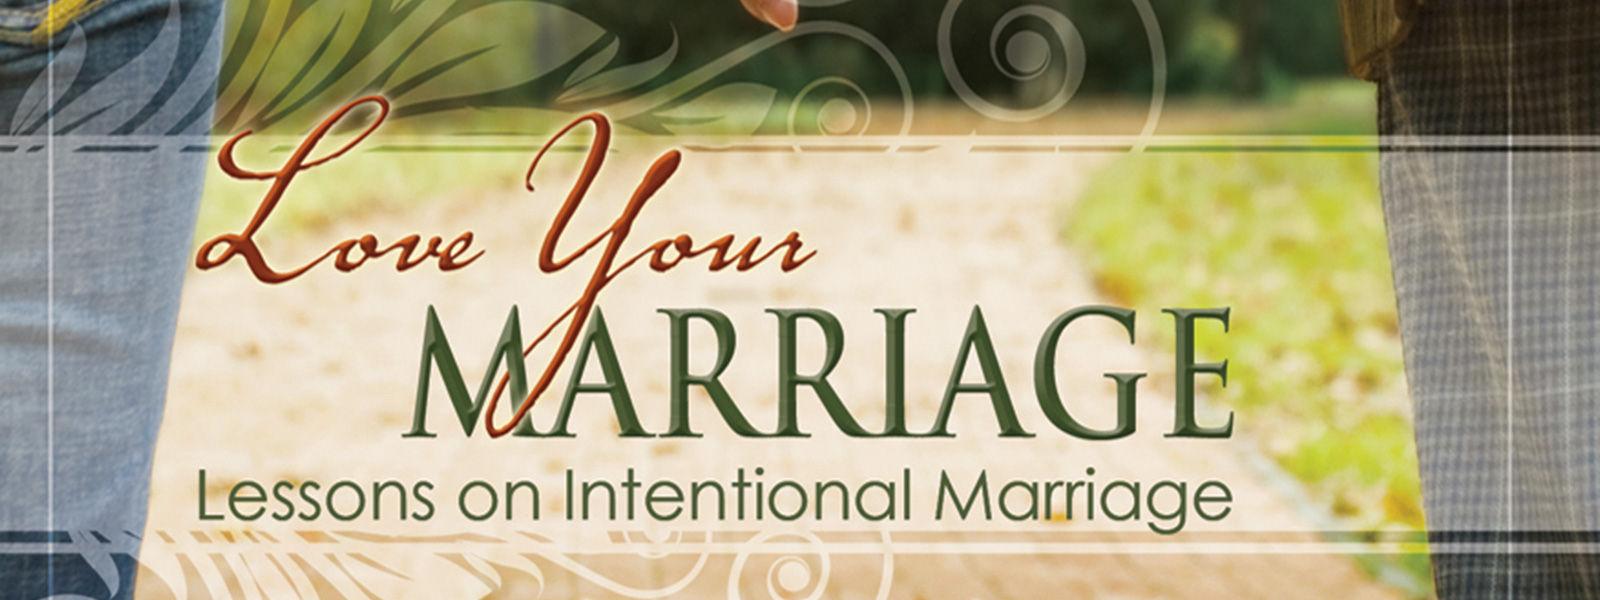 Dr randy carlson marriage